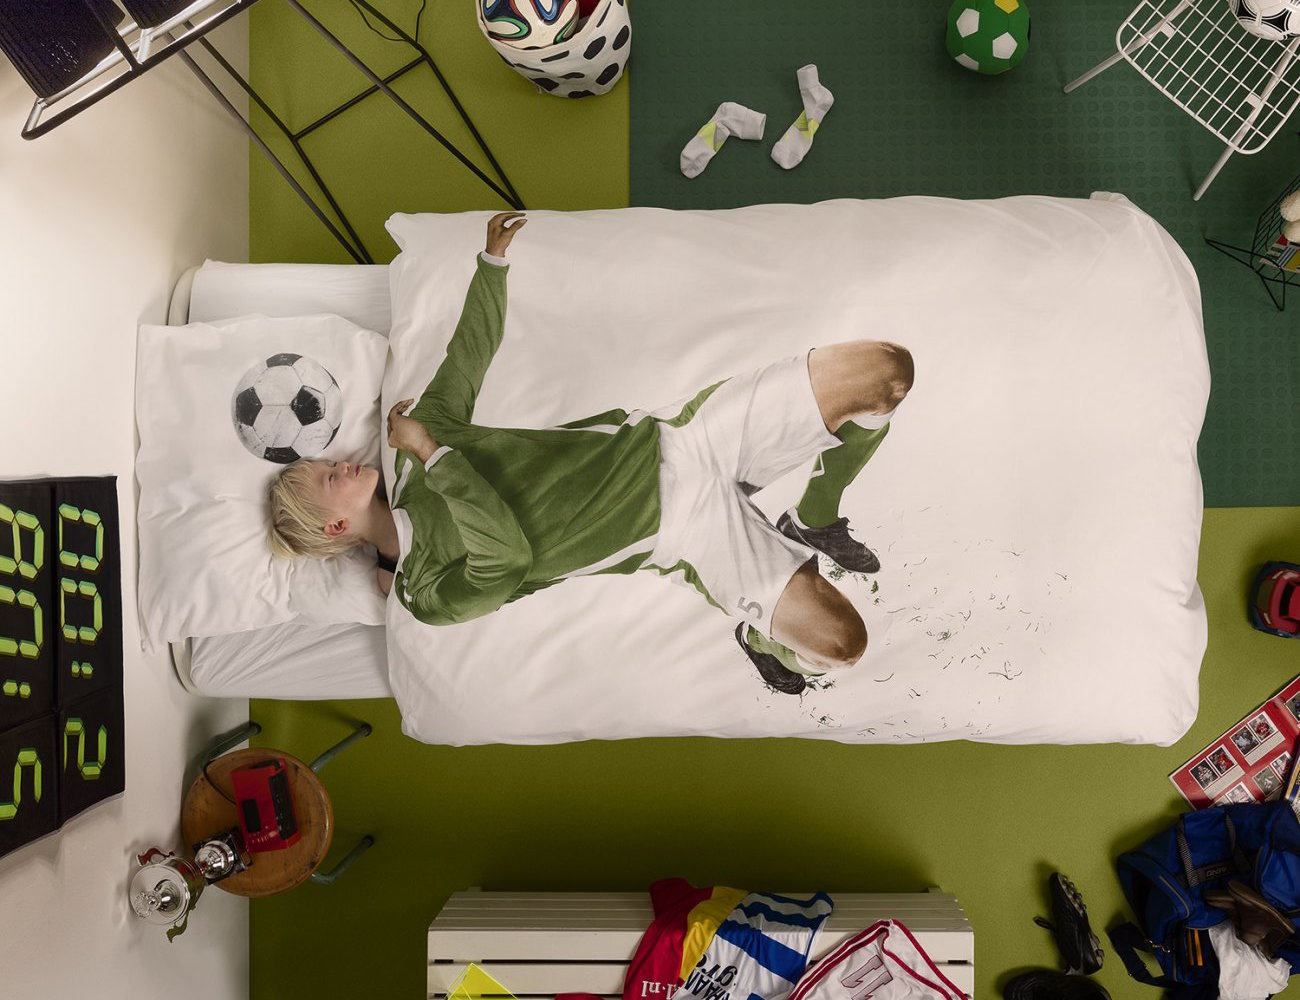 Soccer Champ Duvet Cover by Snurk